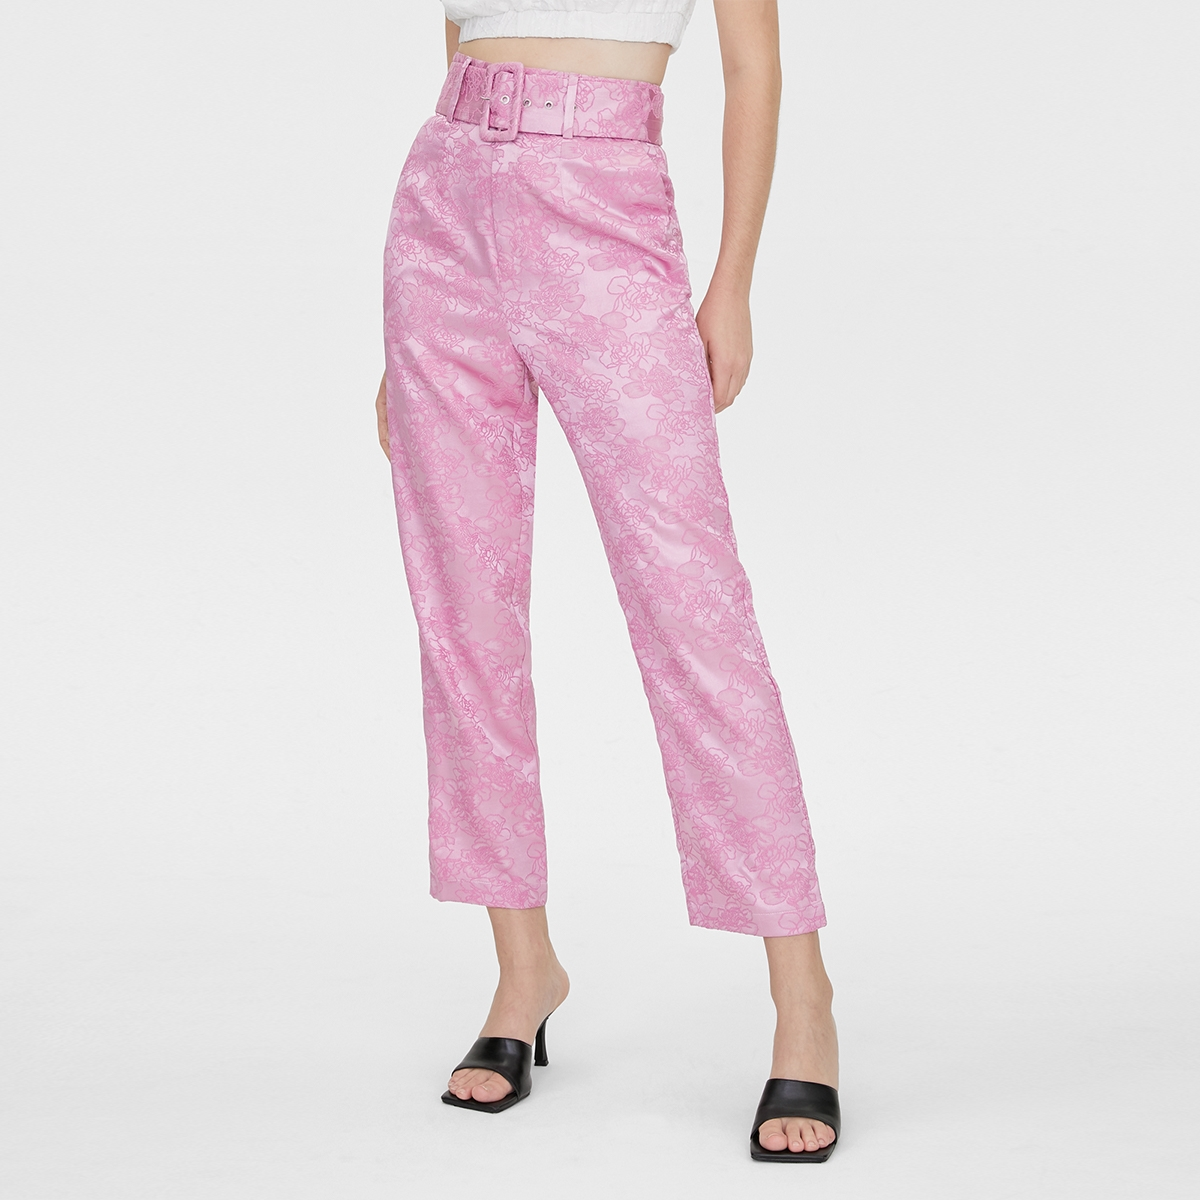 Matter Makers Satin Jacquard Classic Trousers Pink